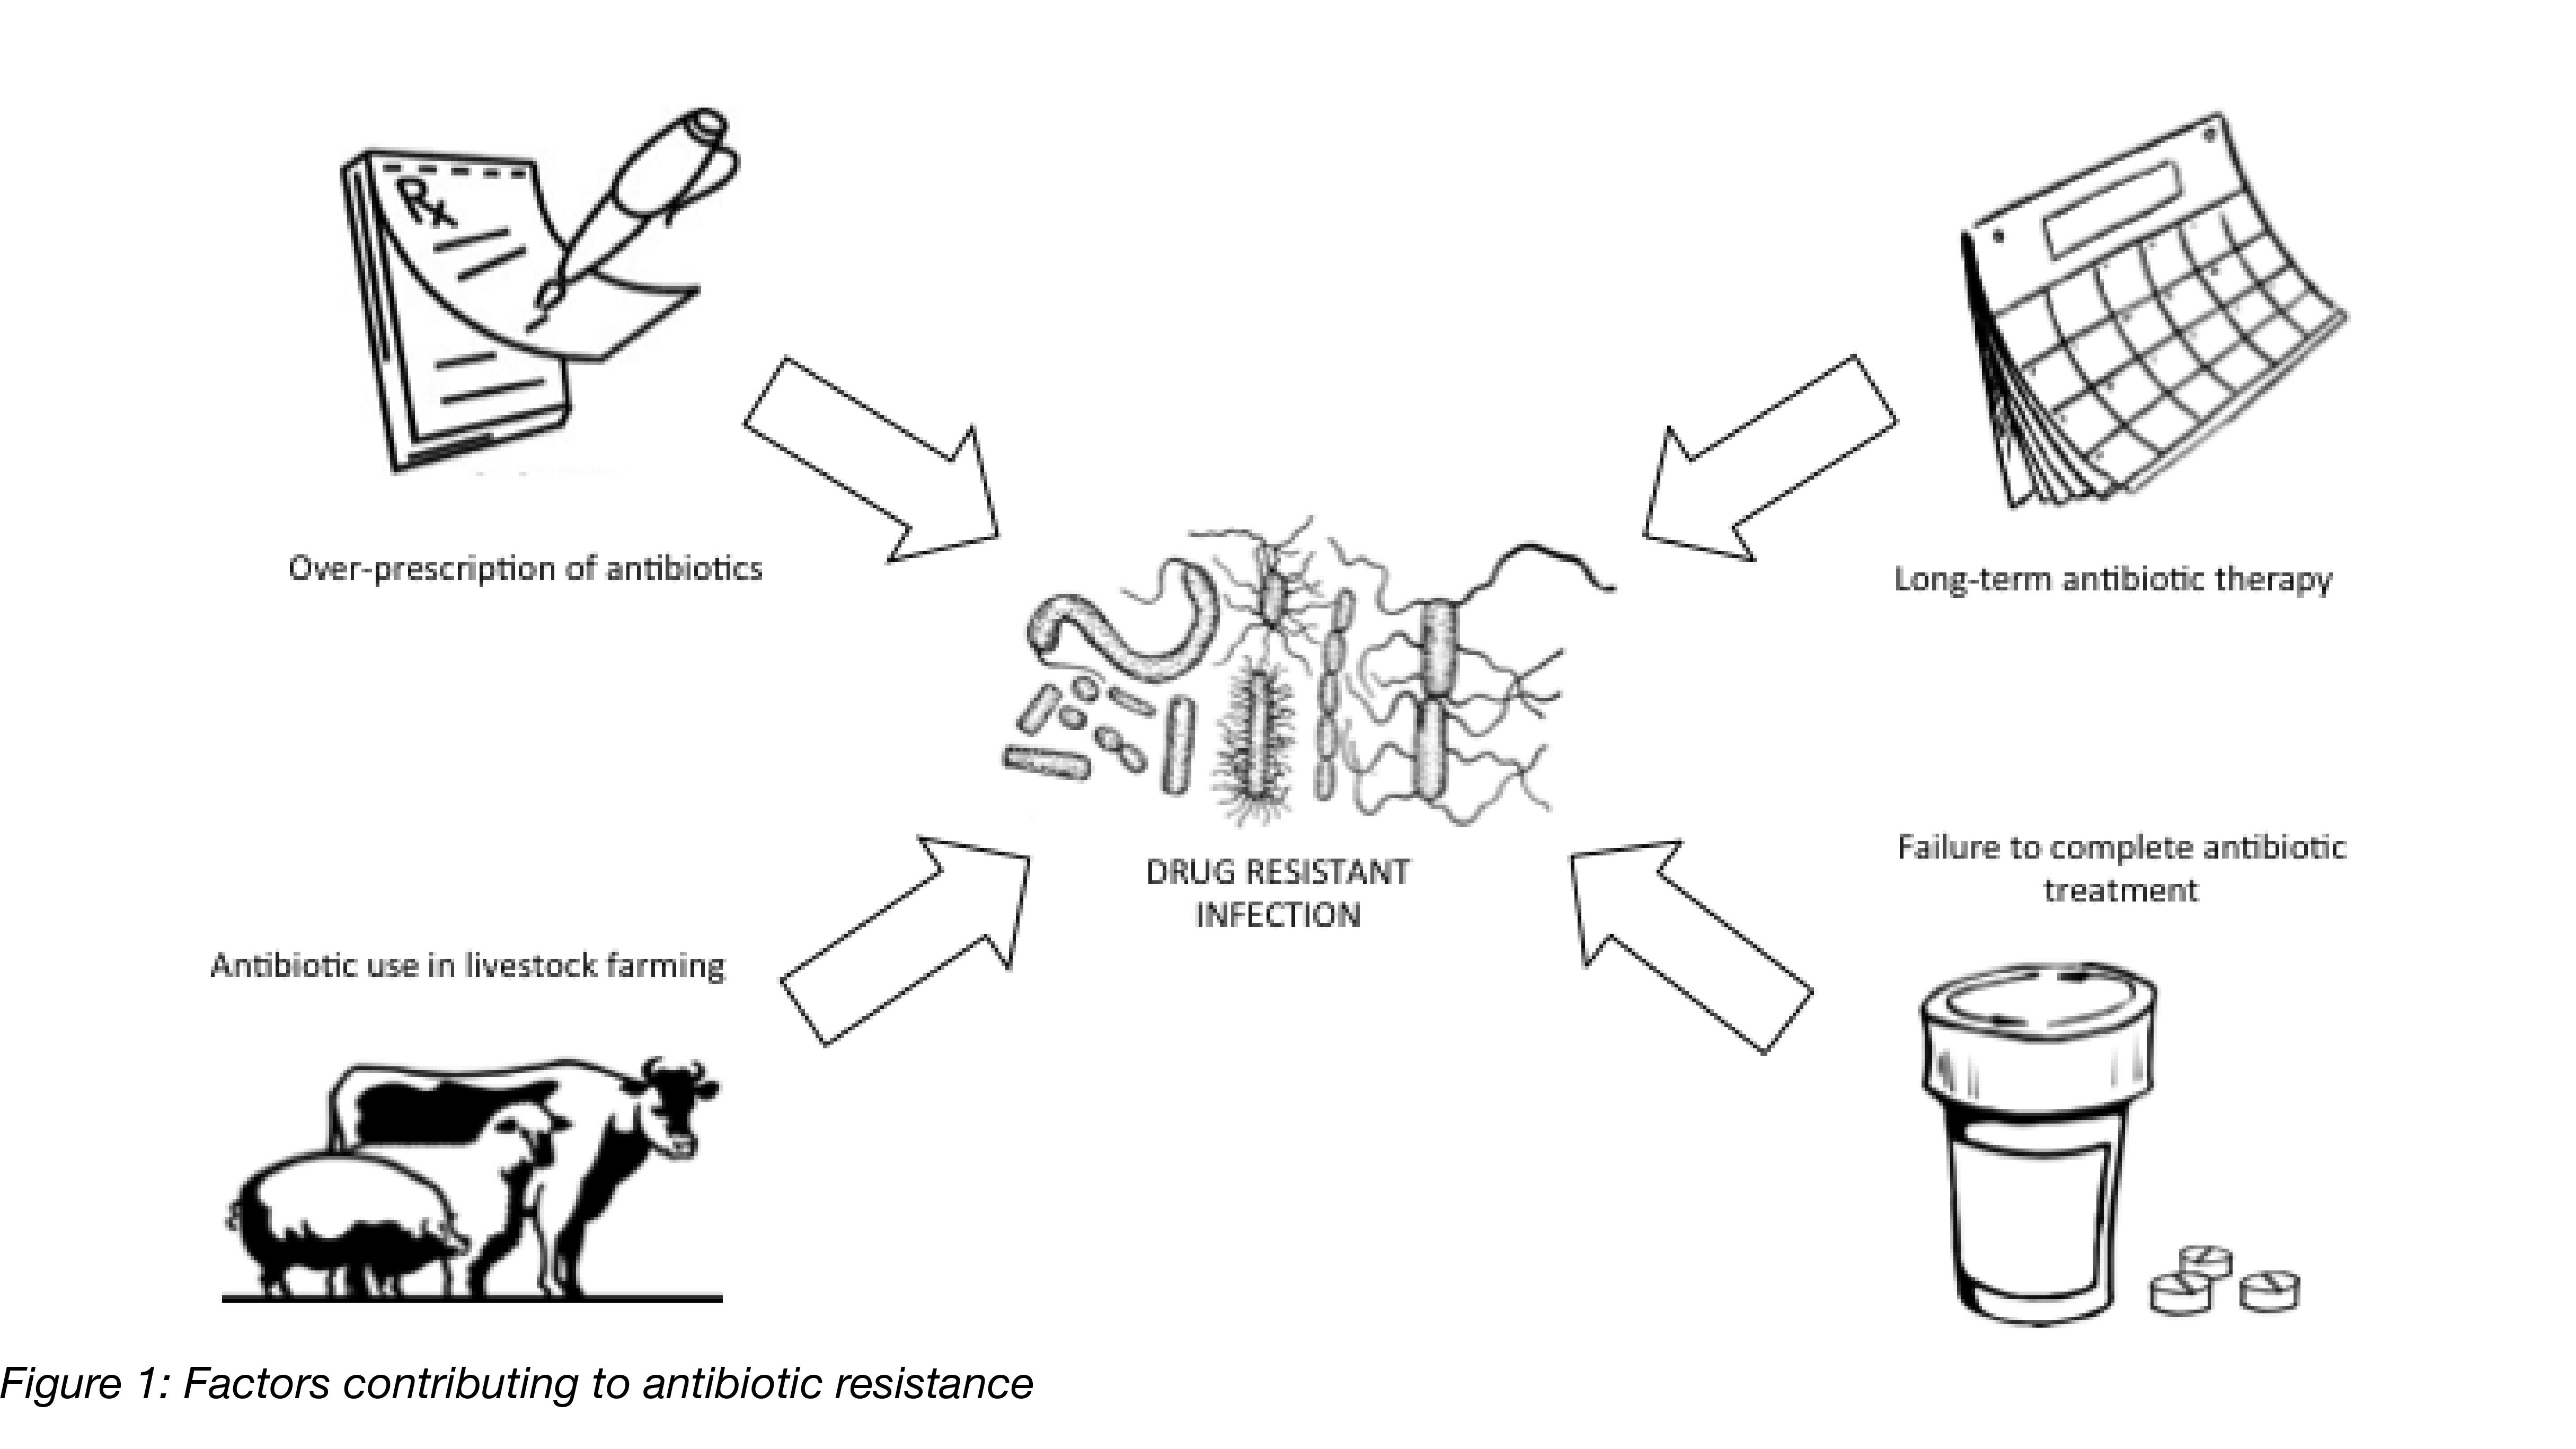 Factors Contributing to Antibiotic Resistance